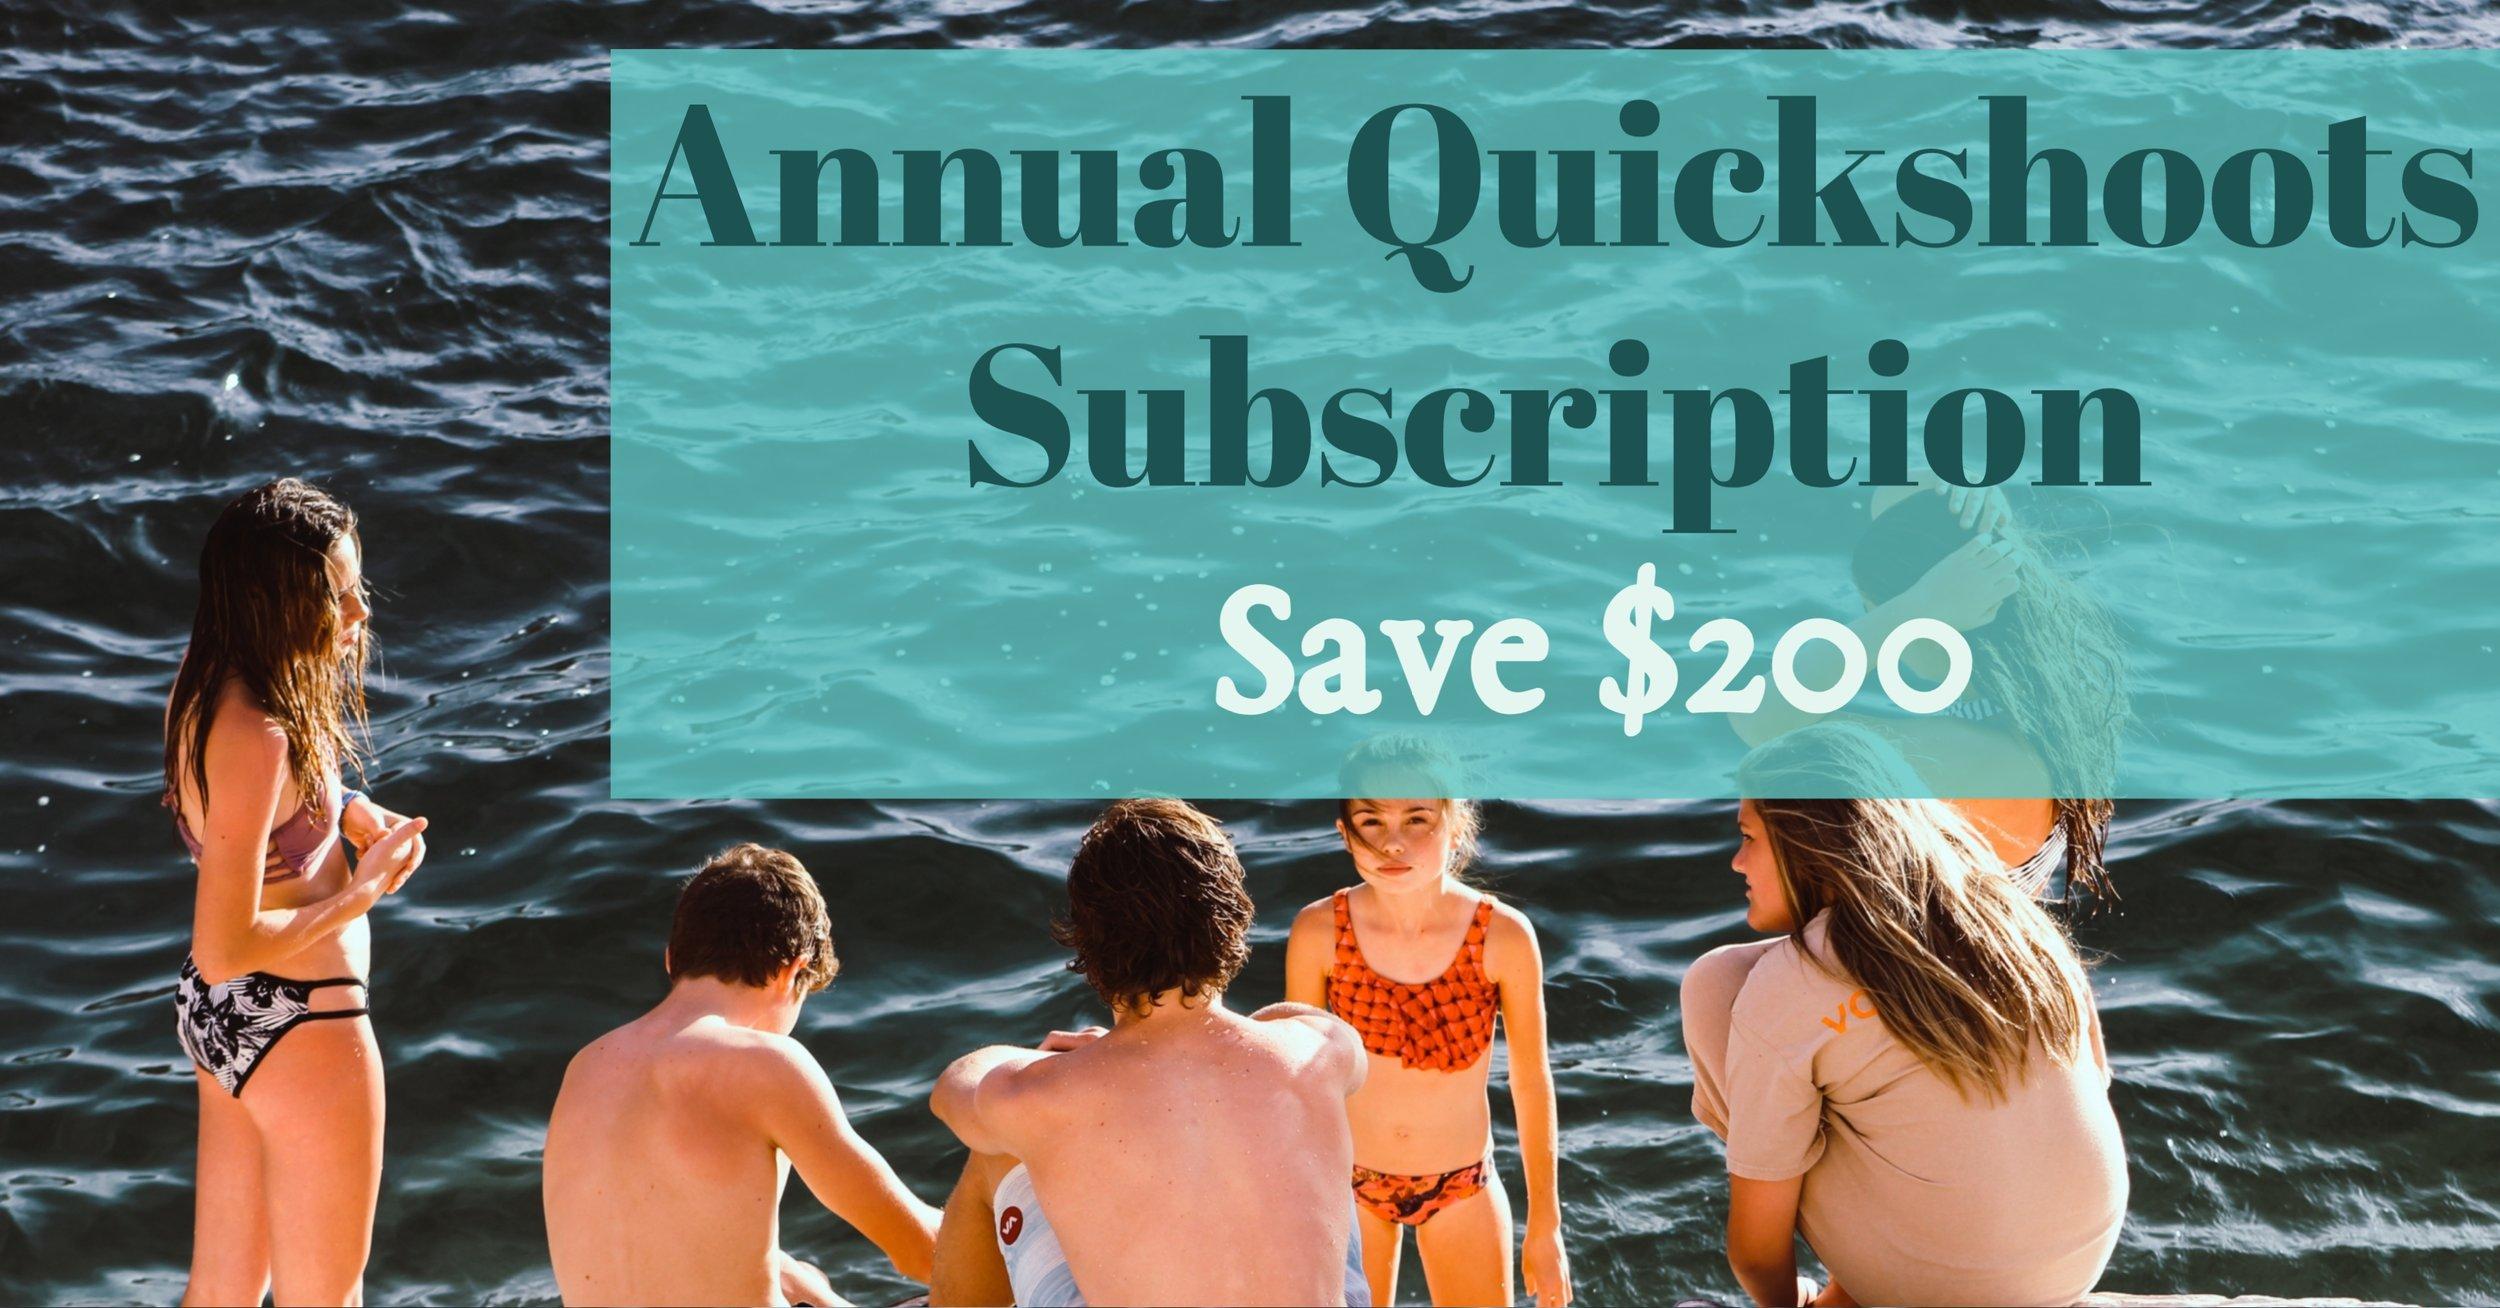 Annual-Quickshoots (3).jpg